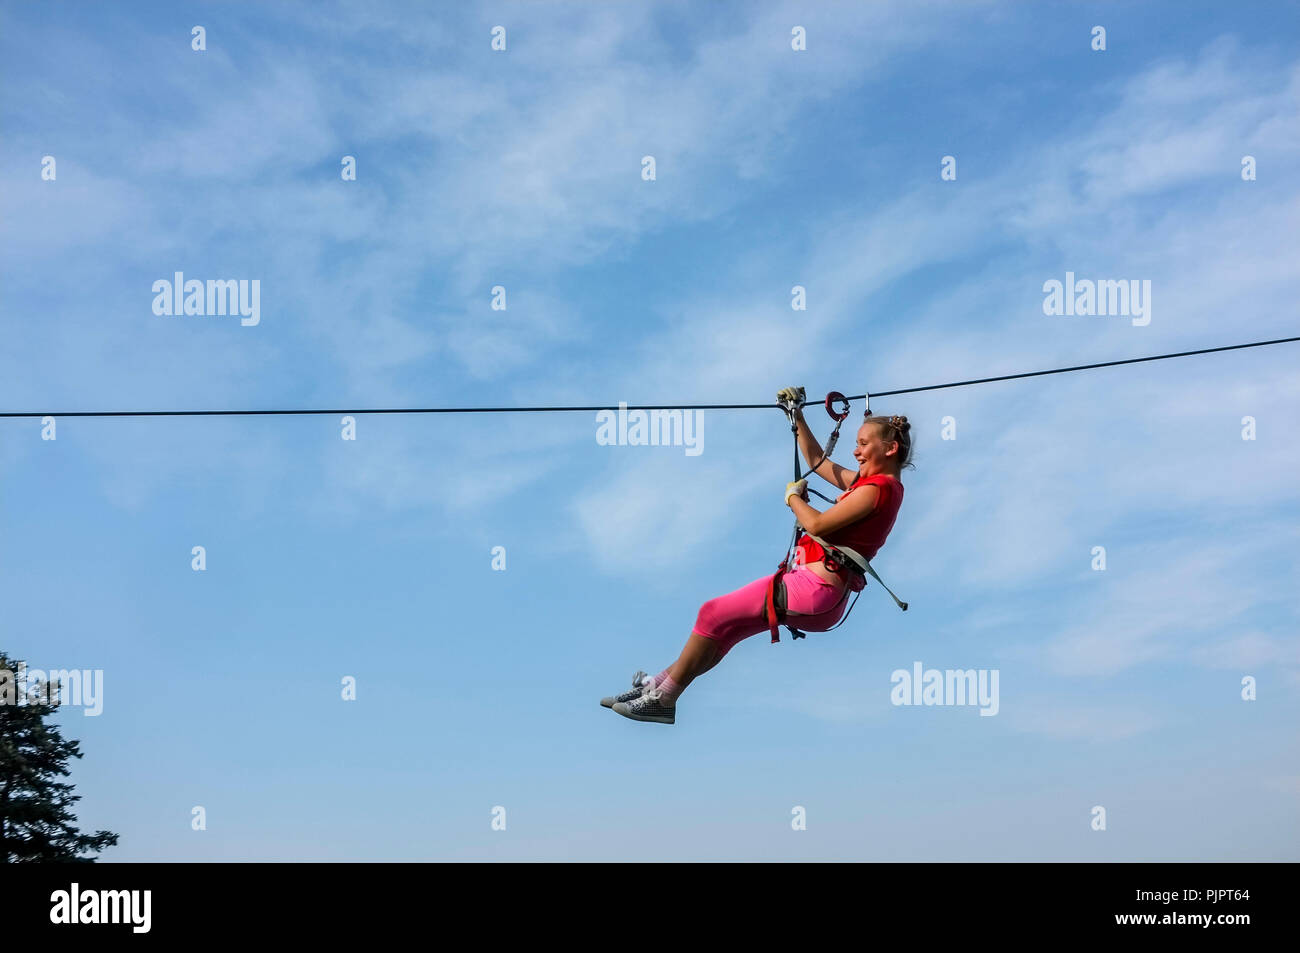 pre-teen-girl-on-a-zip-line-against-the-sky-PJPT64.jpg